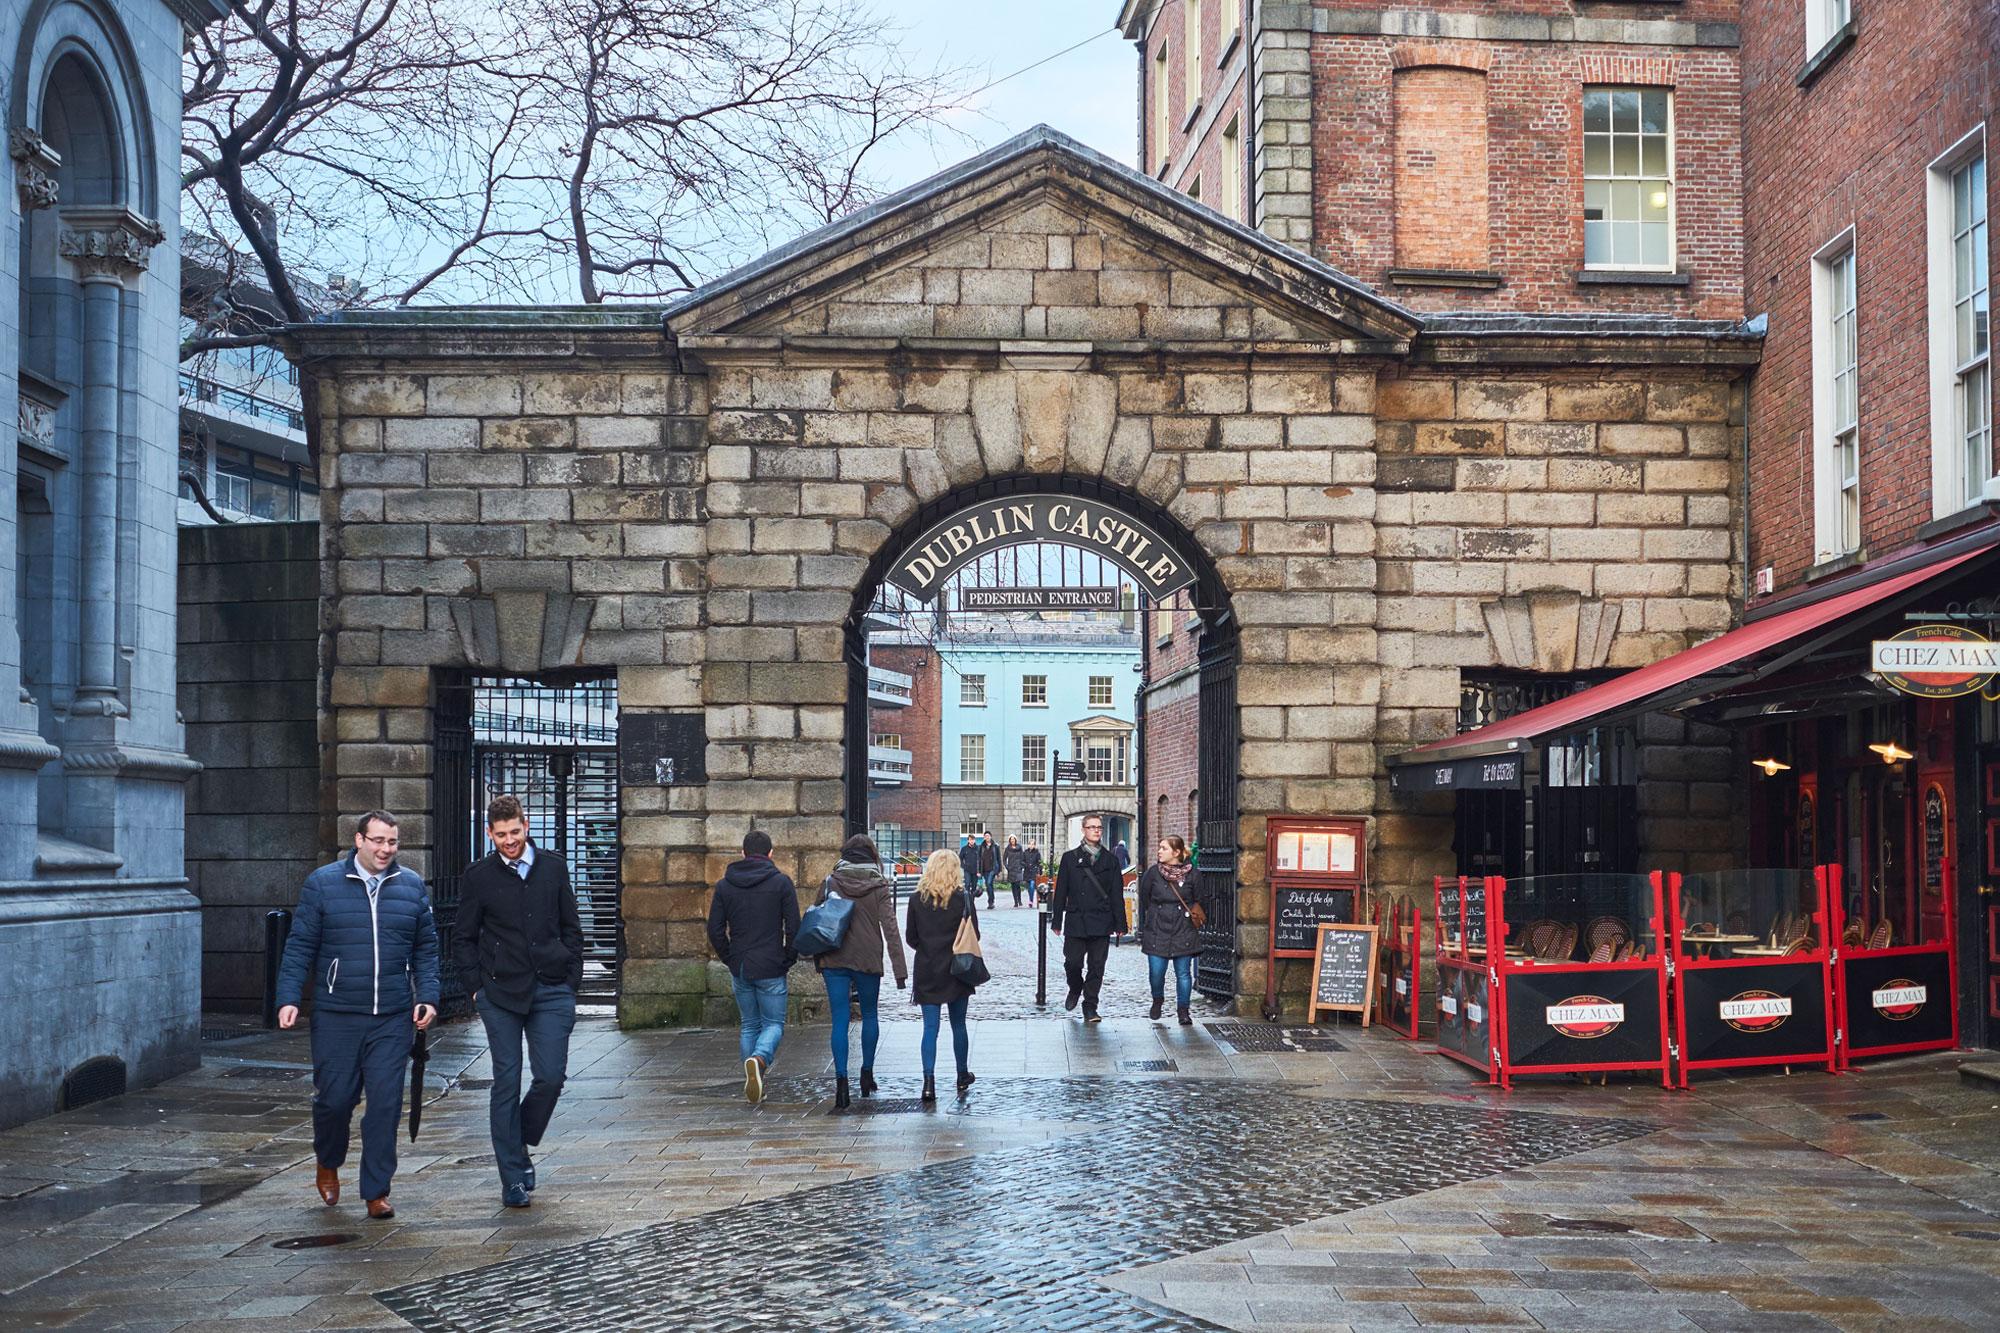 The gate at Dublin castle